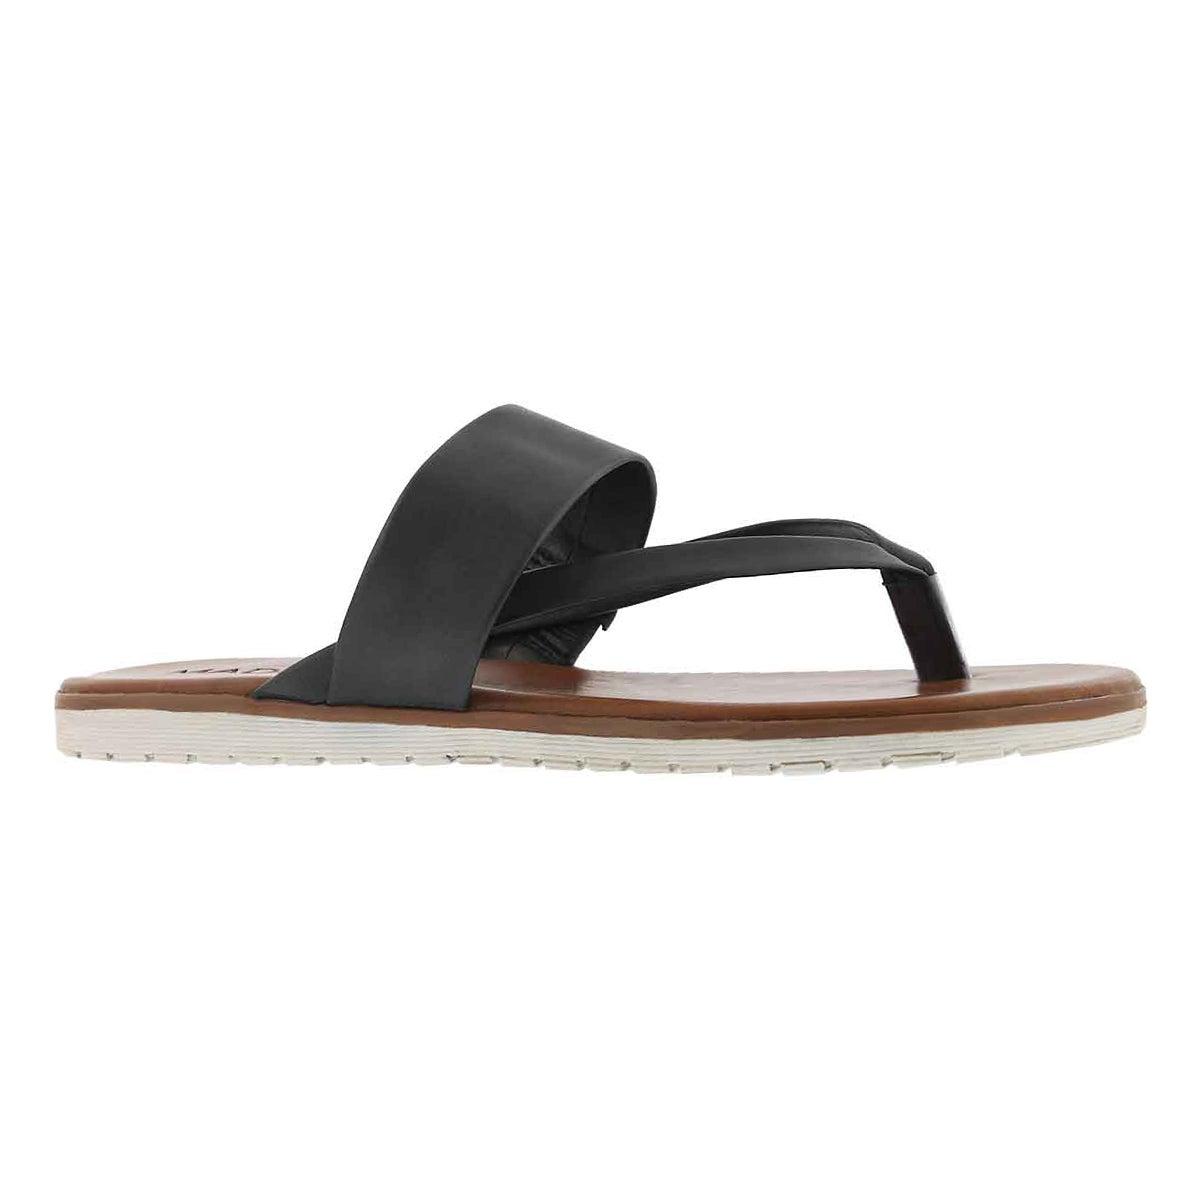 Women's GISELLE black thong sandals